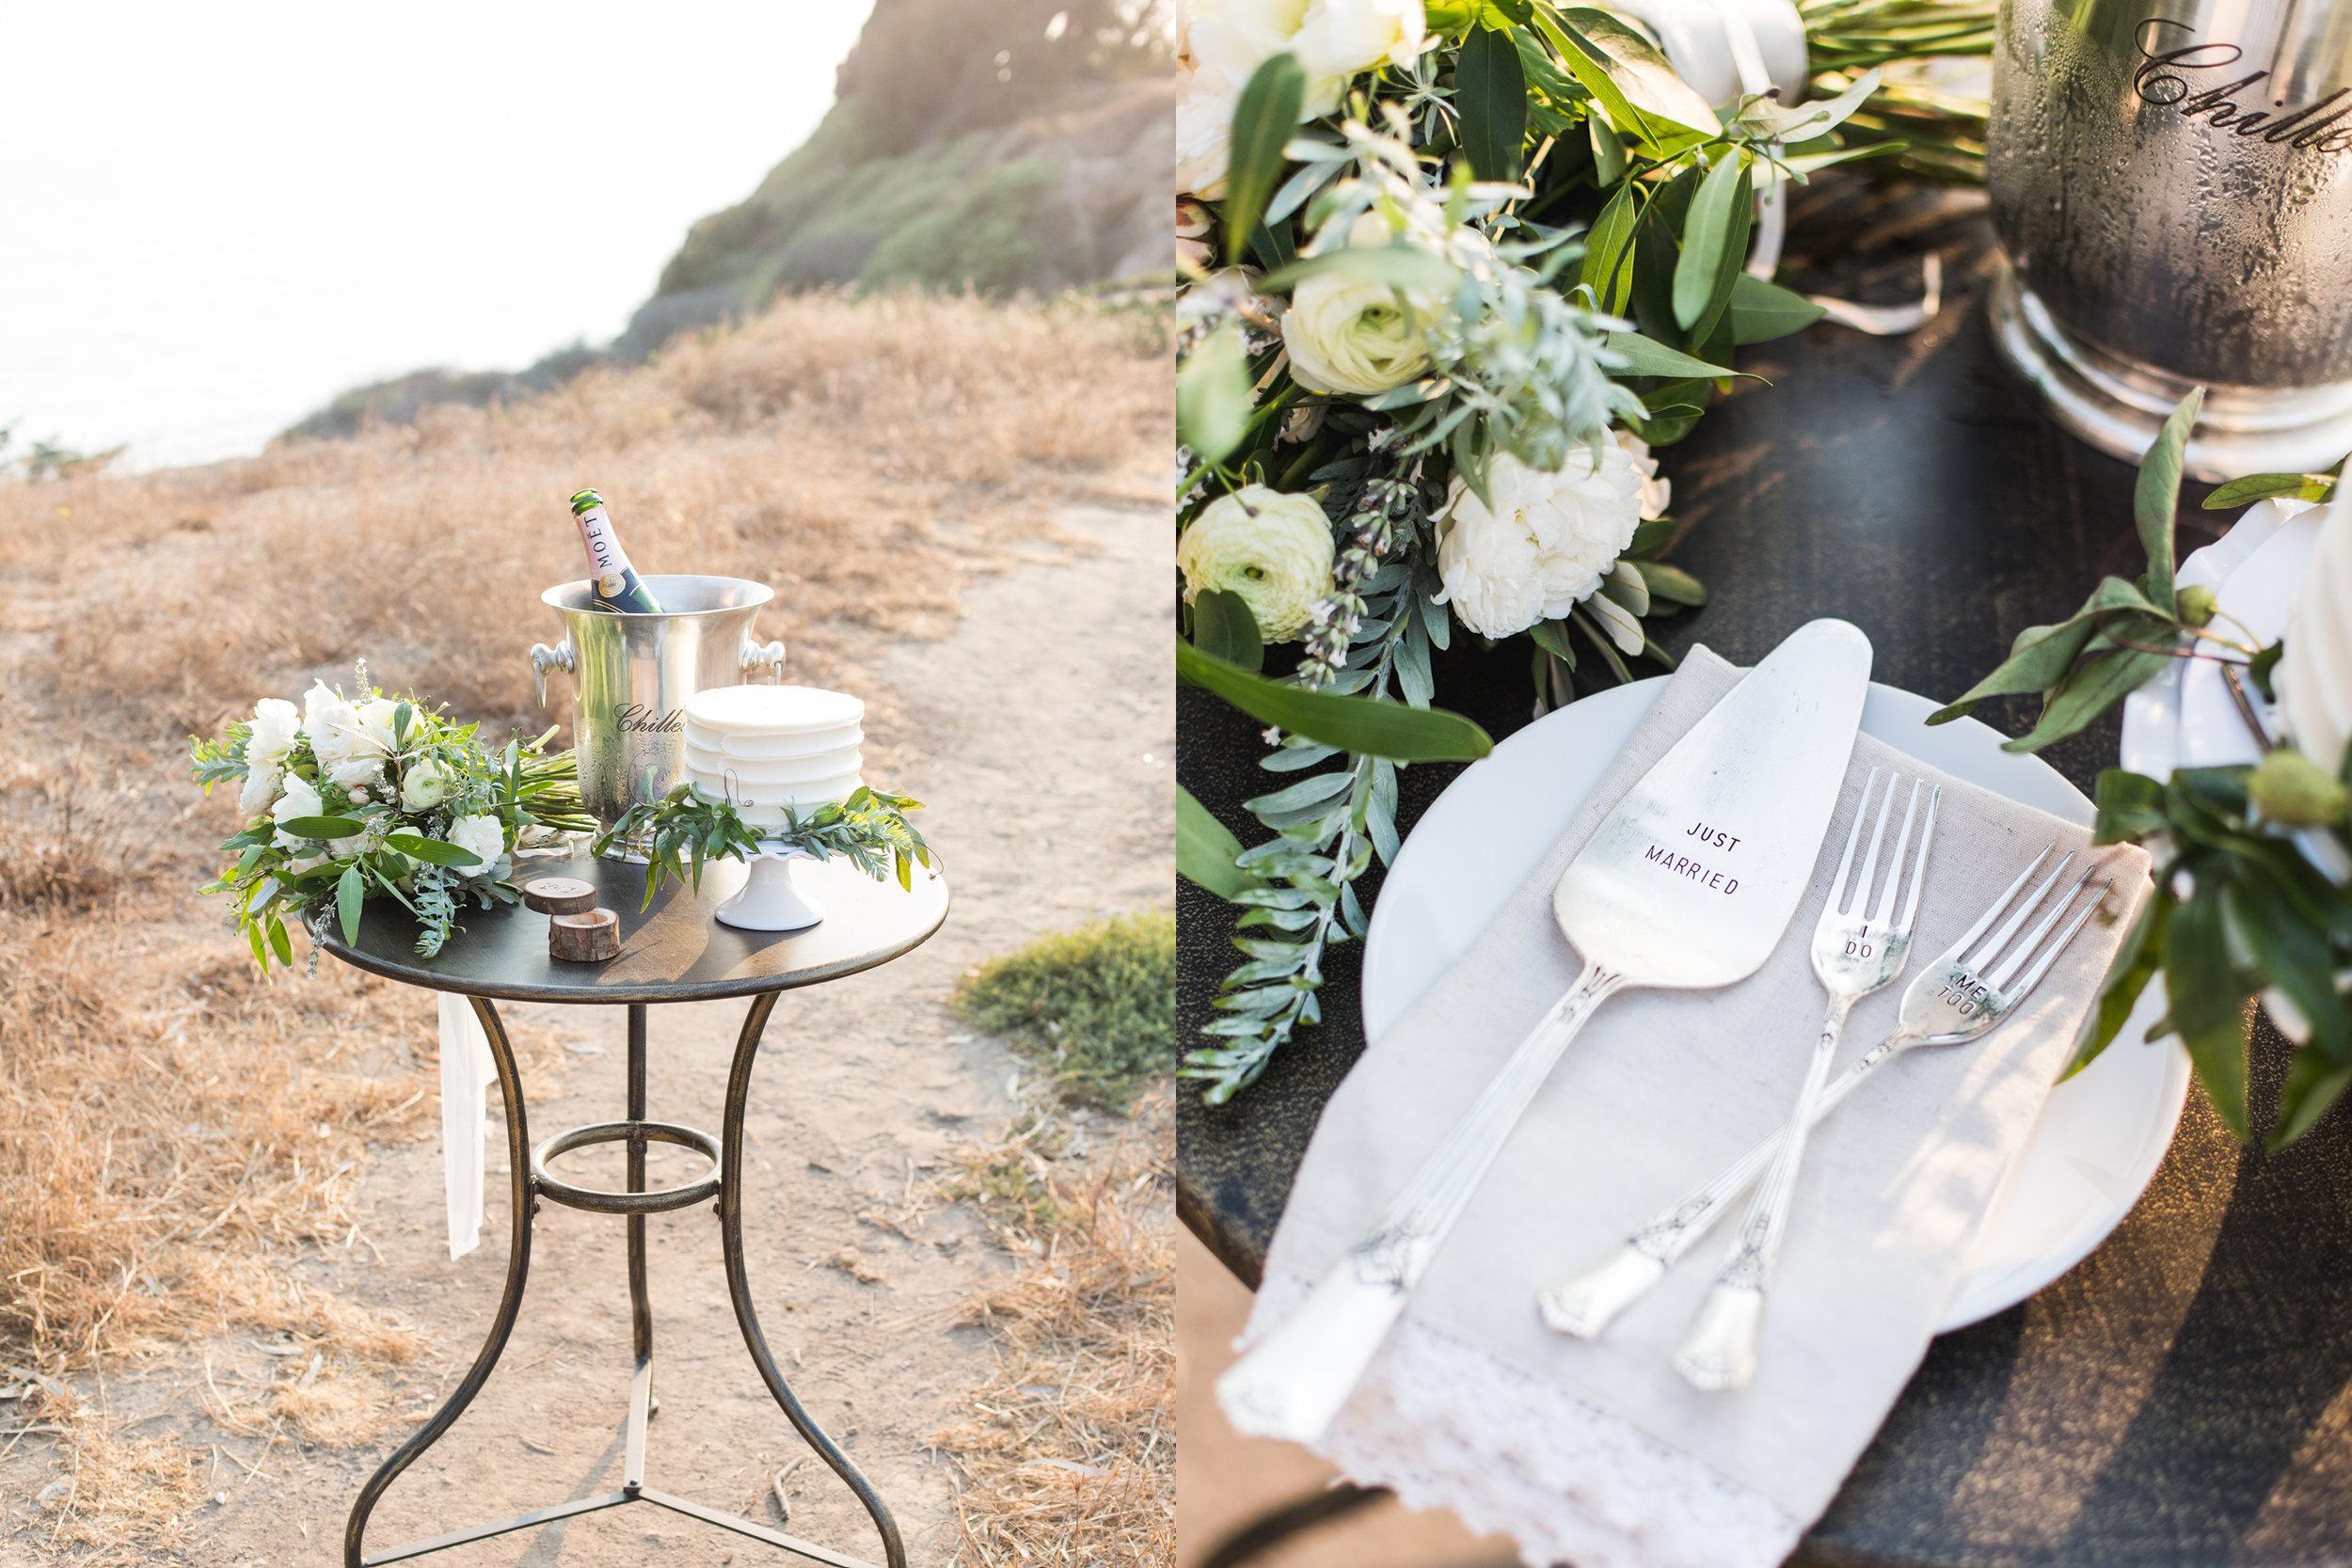 santa-barbara-elopement-elope-wedding-planner-coordinator-coordination-day-of-intimate-rustic-ellwood-bluffs-forest-beach-ocean-view-green-white-event (9).jpg